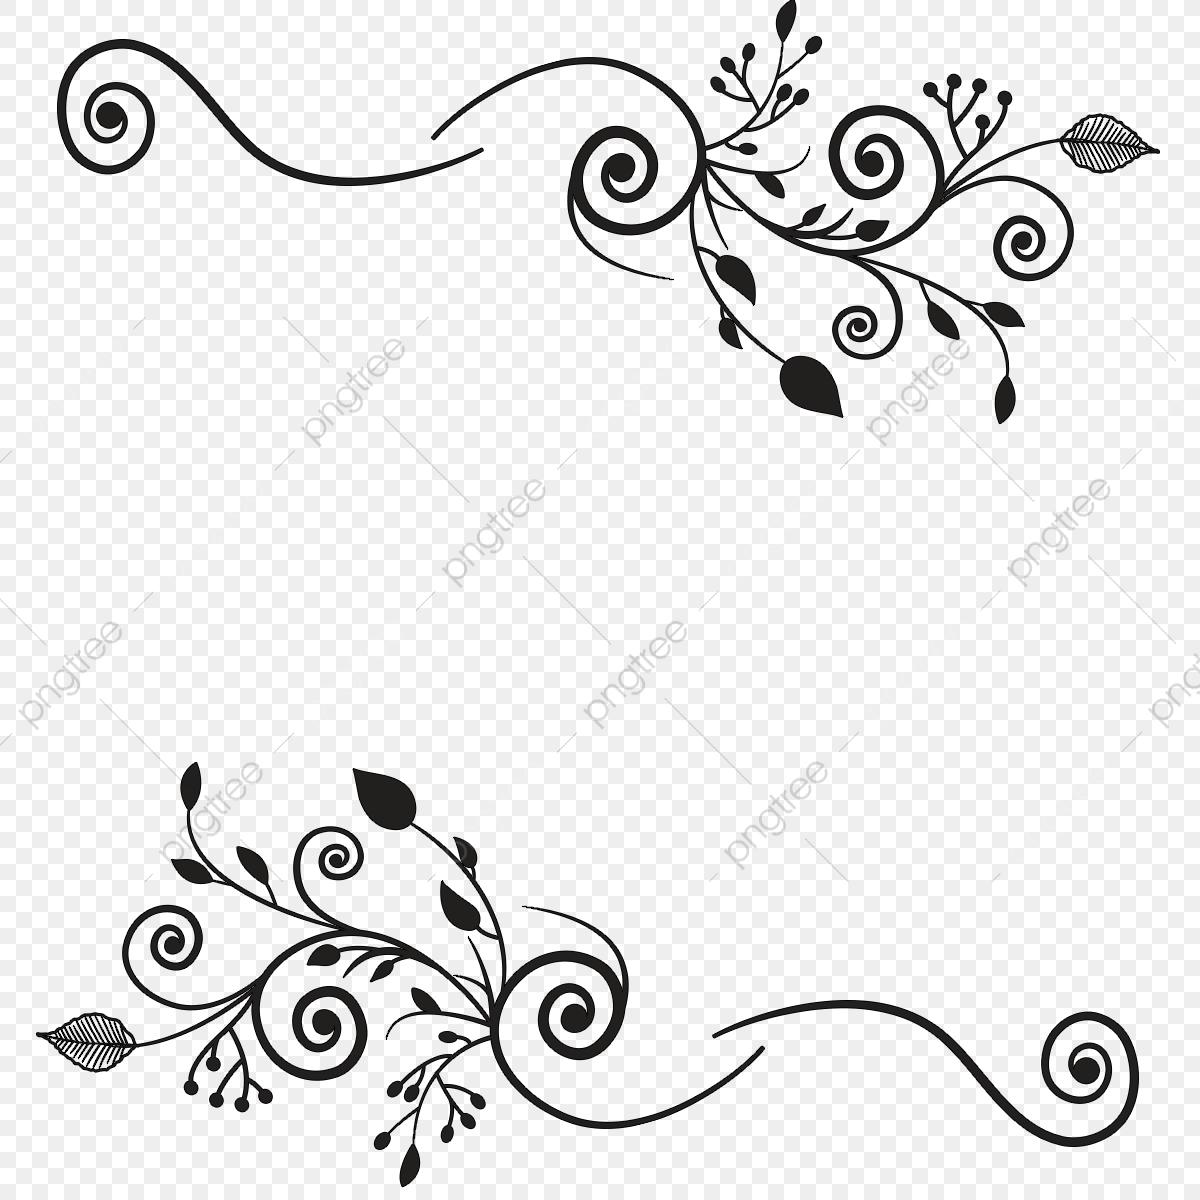 Border Design Element, Floral, Decor, Decoration PNG Transparent.